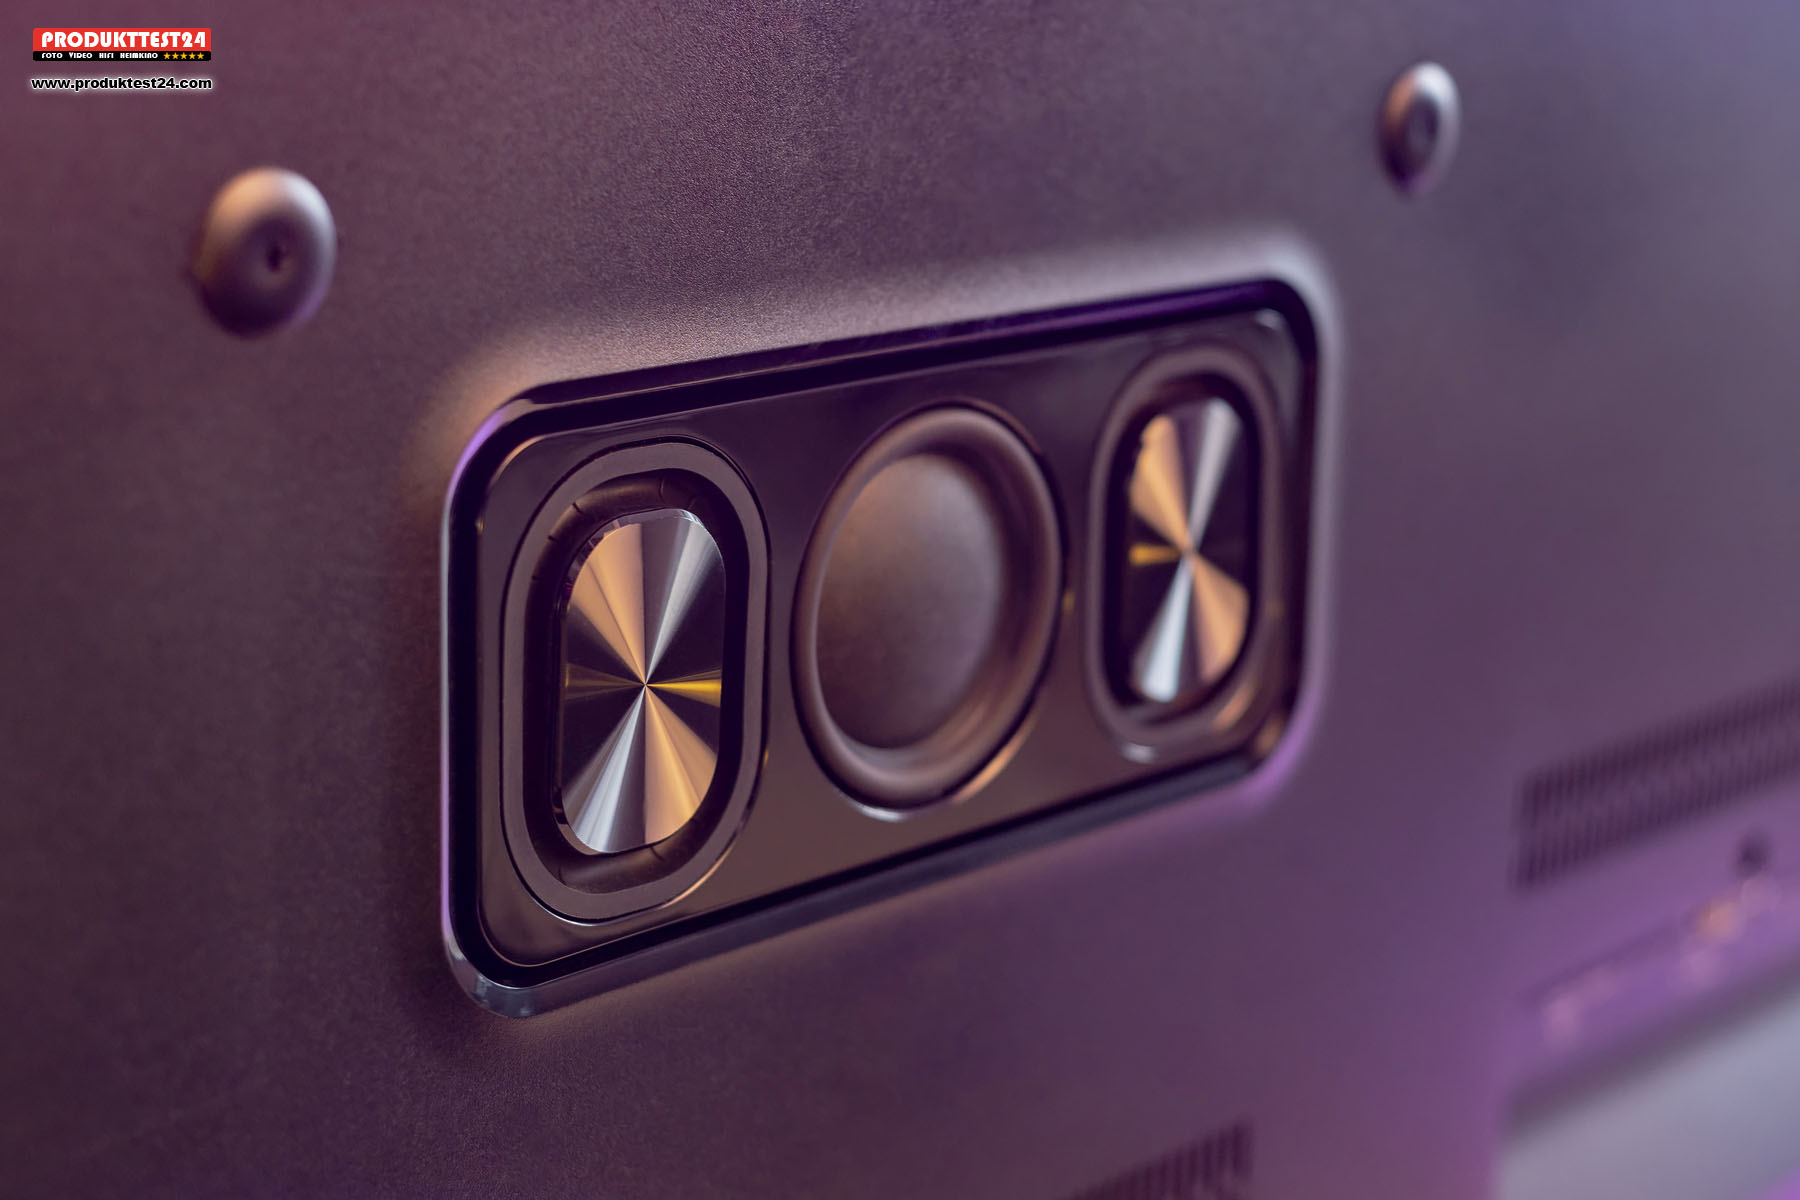 Das 2.1 Kanal Soundsystem mit integriertem Subwoofer